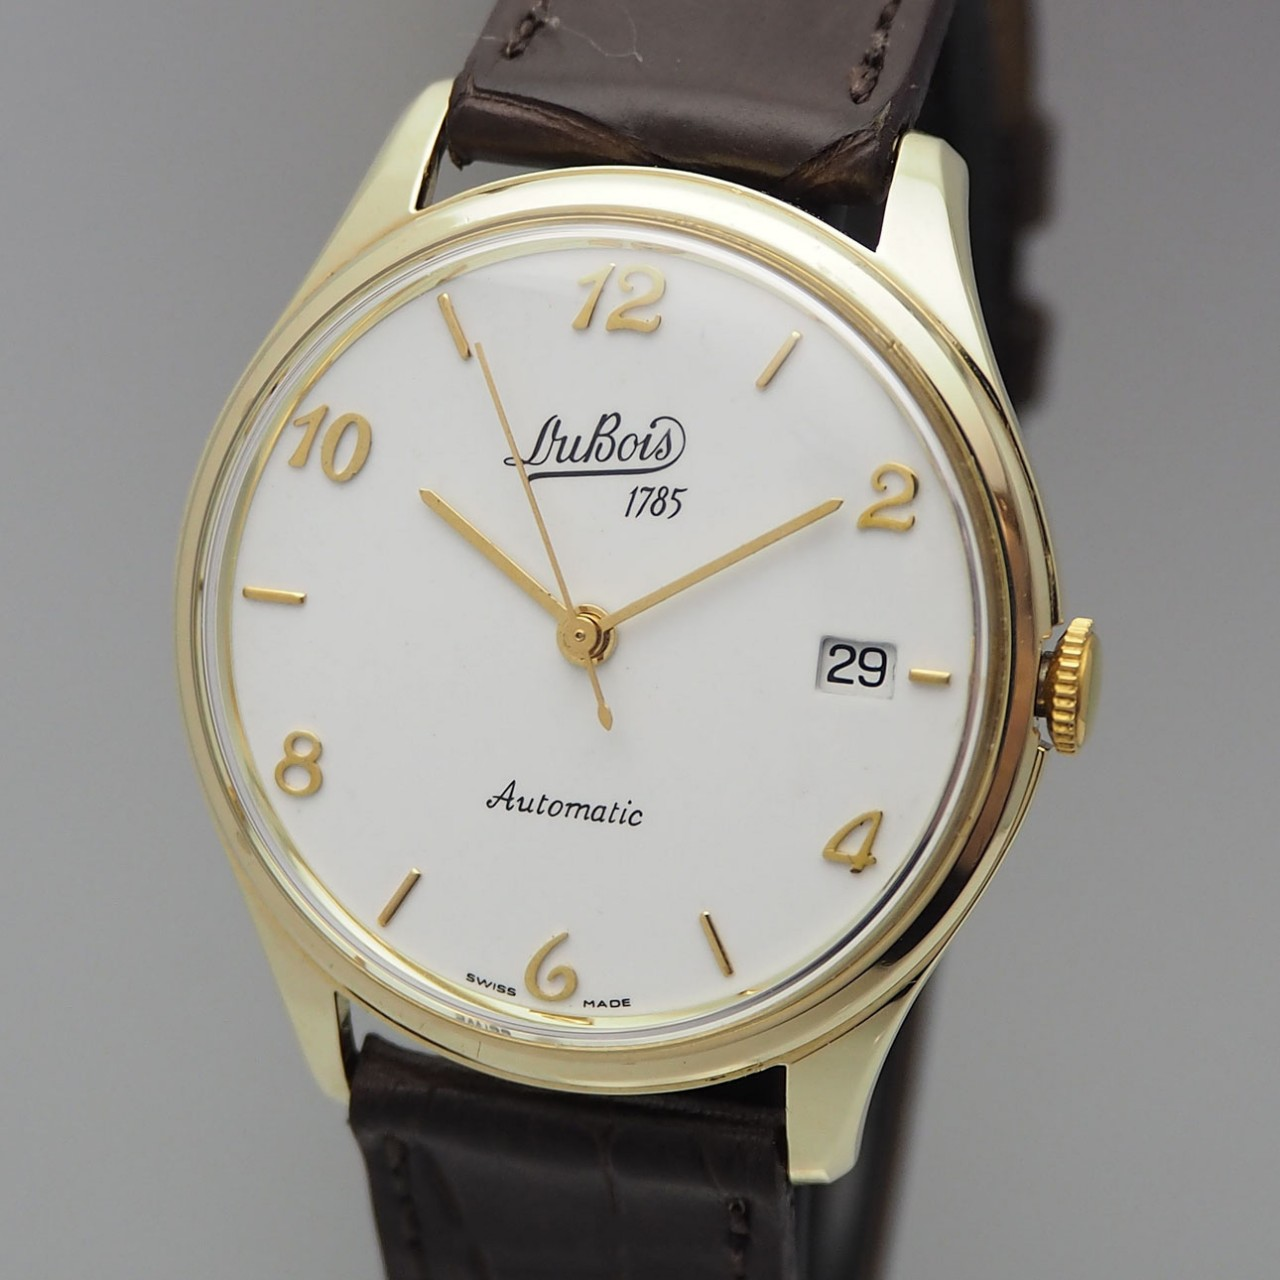 Dubois & Fils Automatik Date Gold 14k/ 585, Calatrava Dress watch very rare